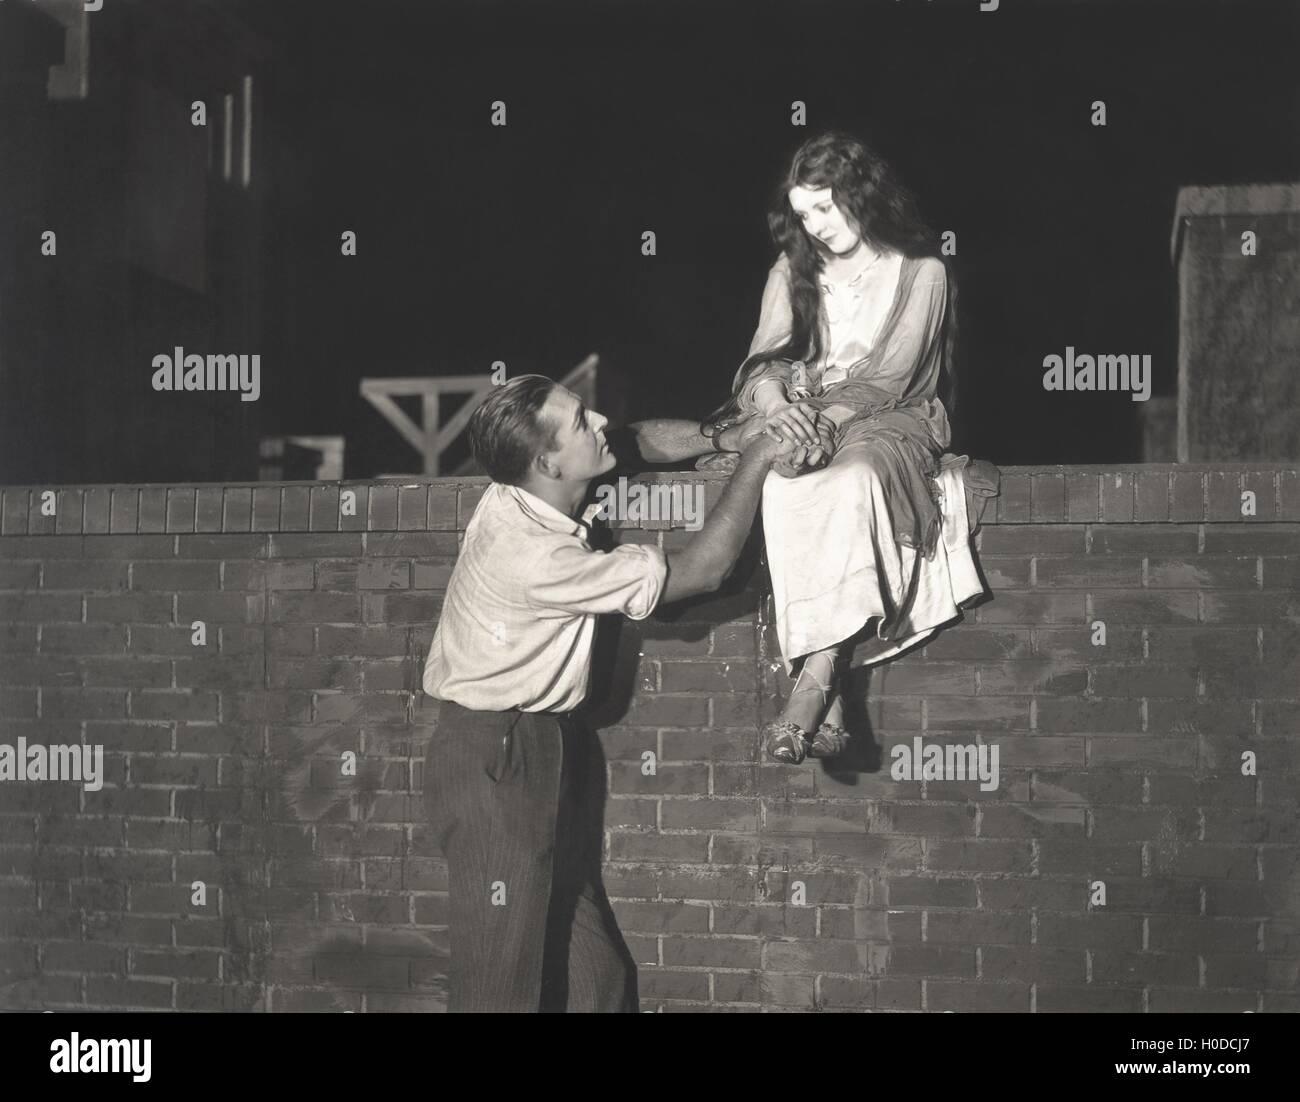 Man wooing woman sitting on brick wall - Stock Image